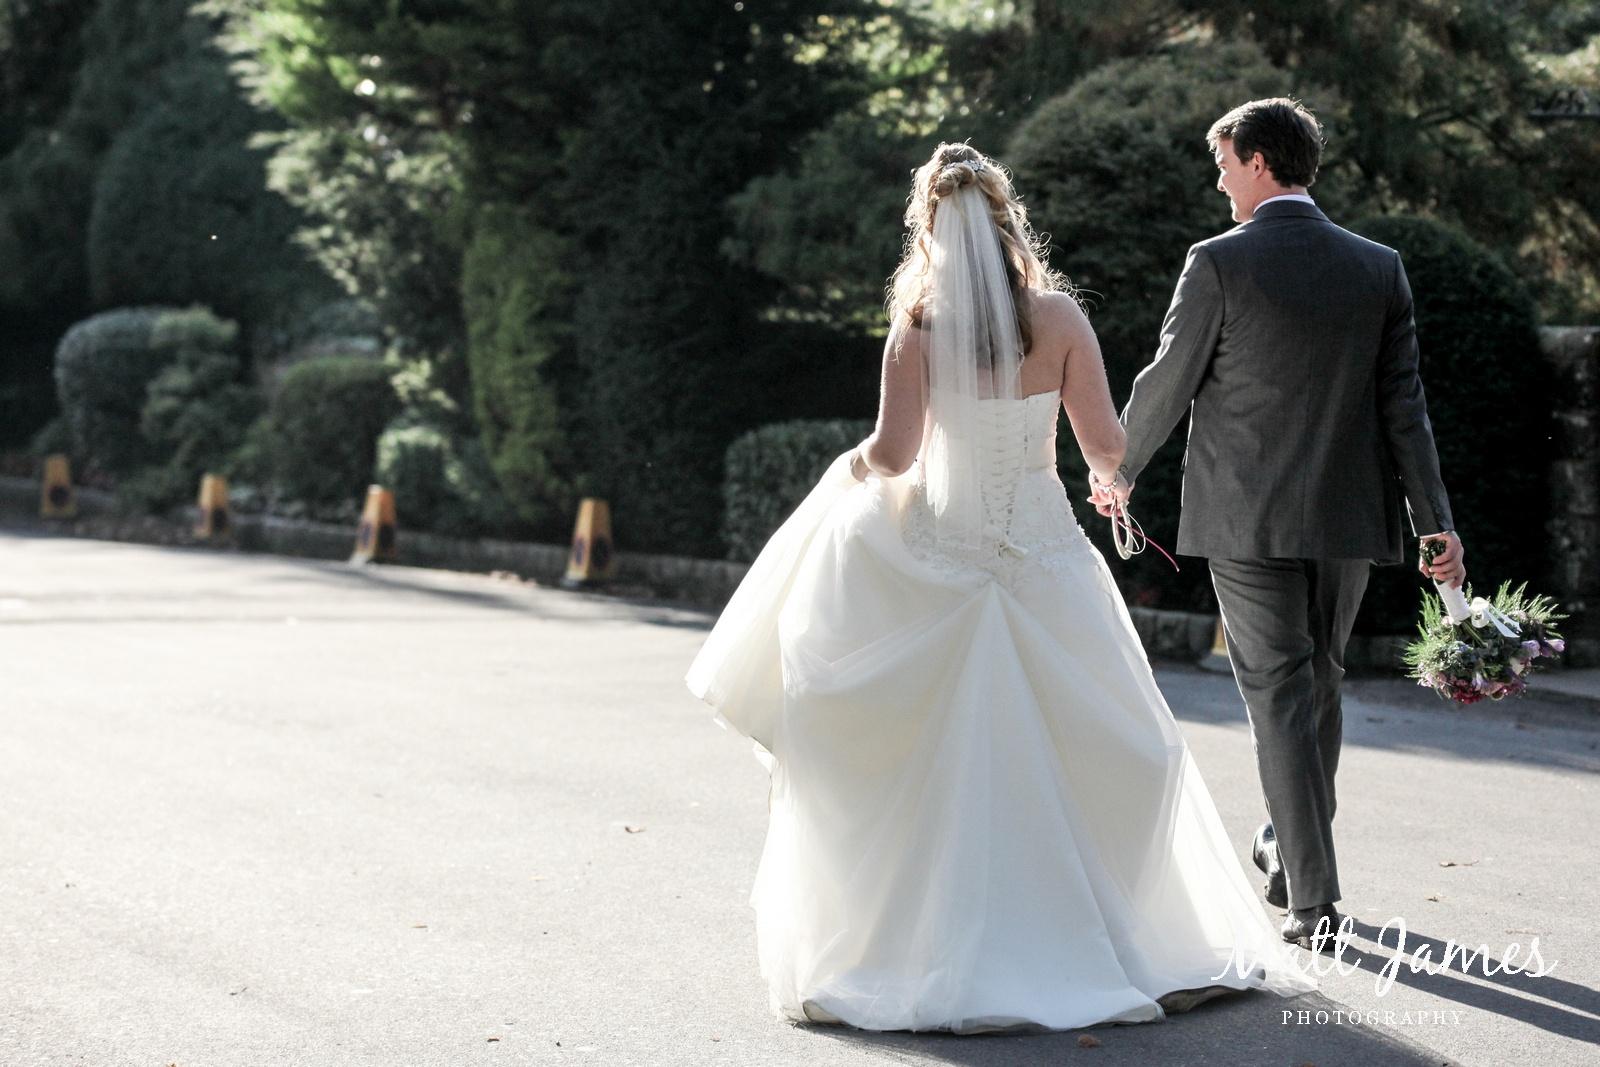 Sevenoaks-documentary-wedding-photographer-246